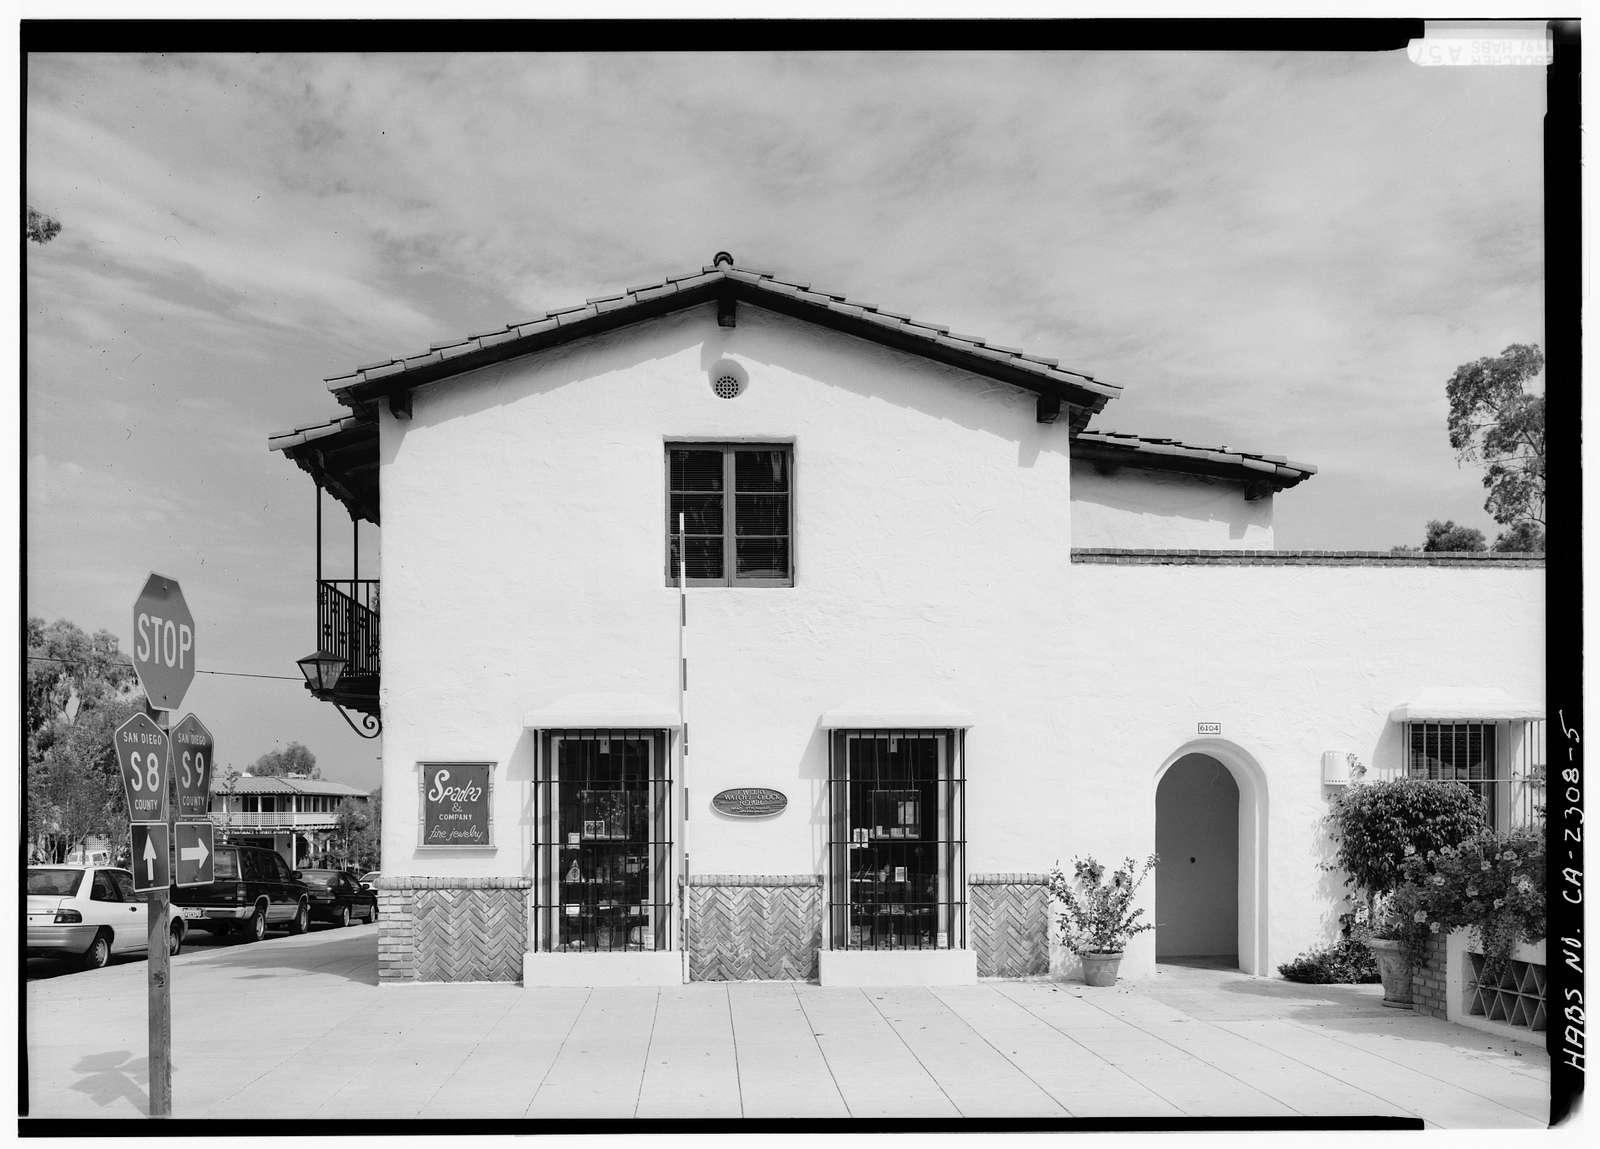 Joers-Ketchum Store, 6014-6016 La Granada, Rancho Santa Fe, San Diego County, CA